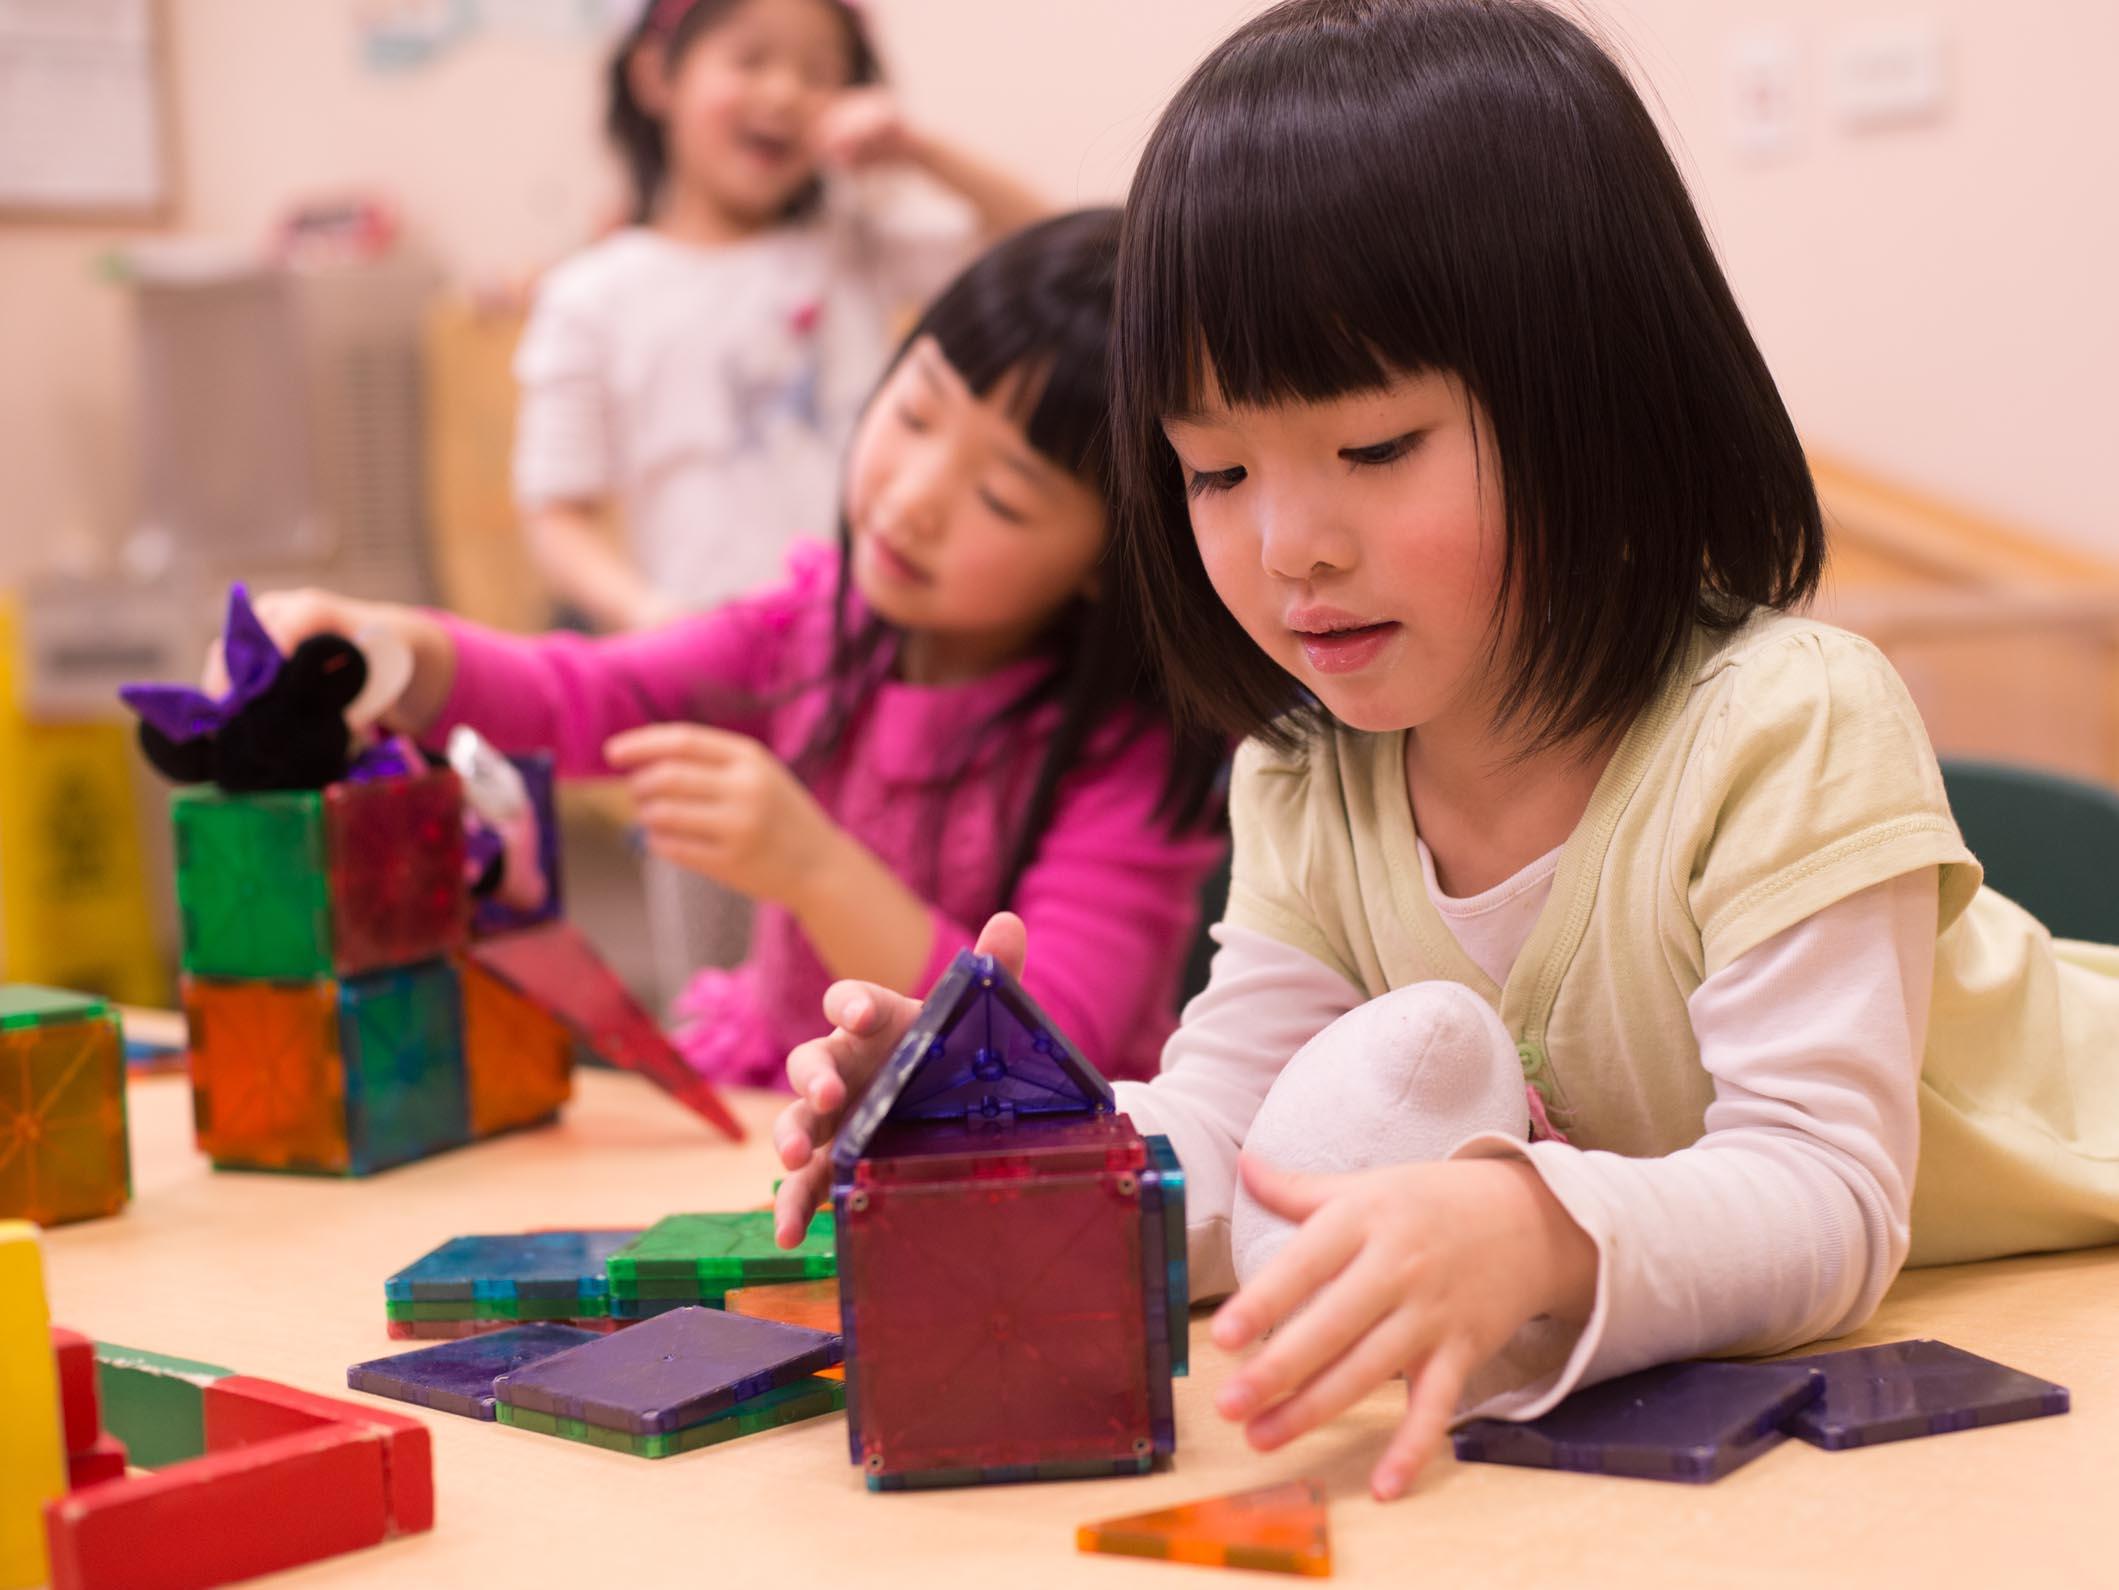 20170213-RK-MATH-2004-professional development teachers prek kindergarten